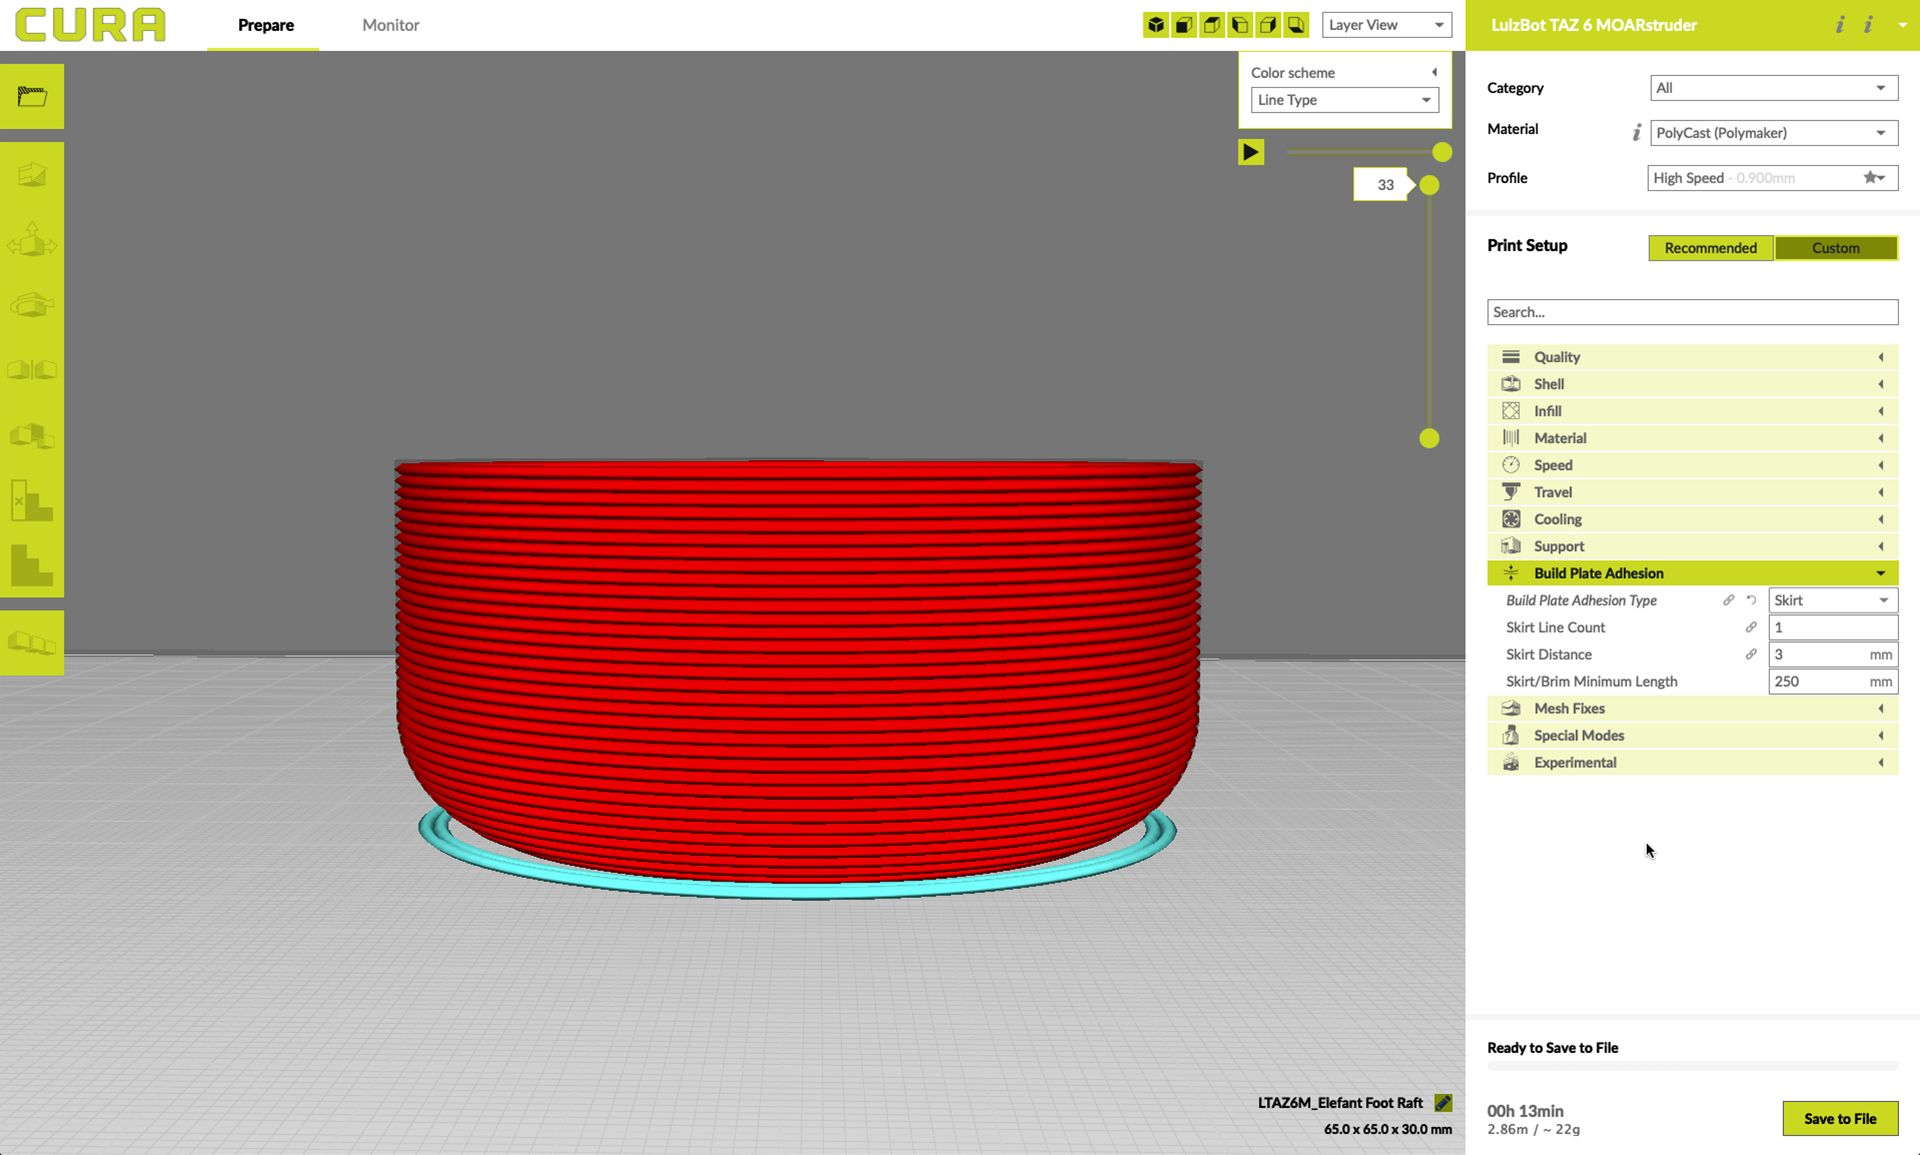 Model of a skirt in Lulzbot's Cura slicer software